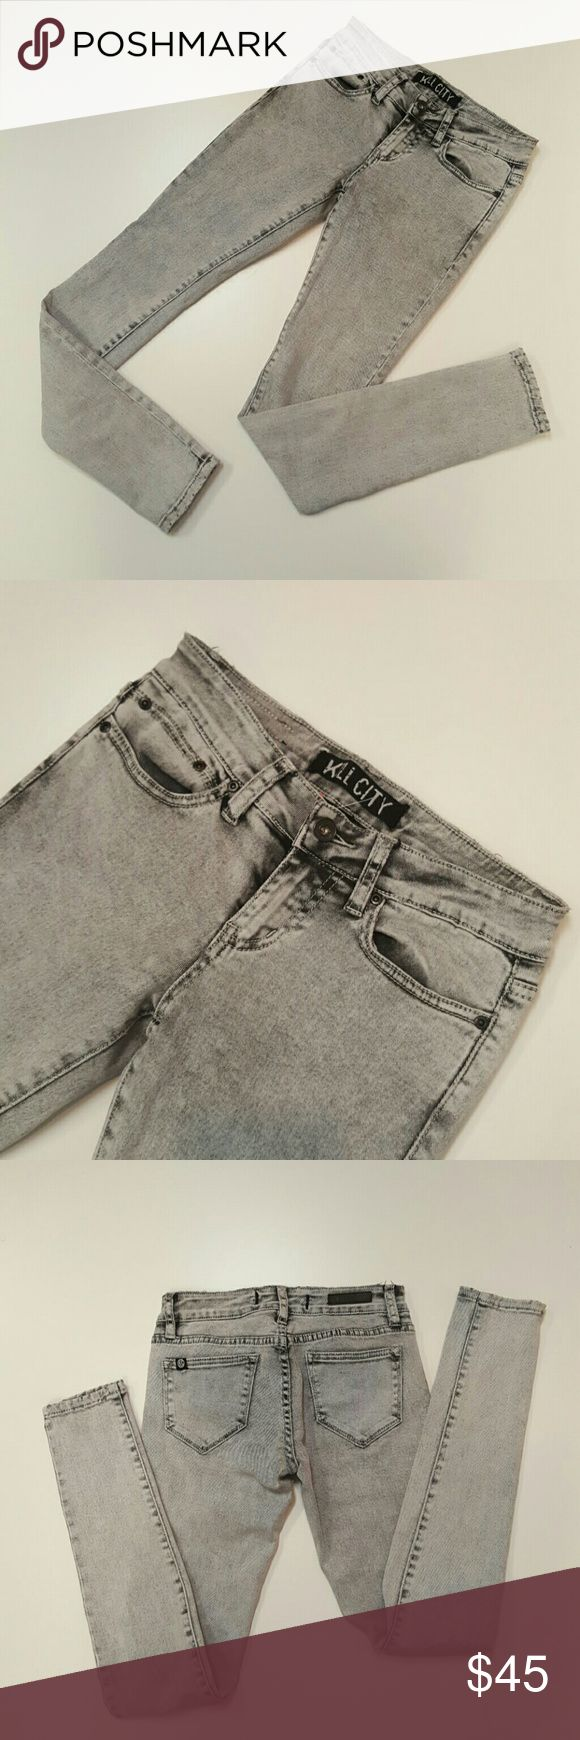 "Kill City Jean 31"" inseam 4.5"" leg opening 97% Cotton 3% Spandex Stretch EUC Kill City Jeans Skinny"